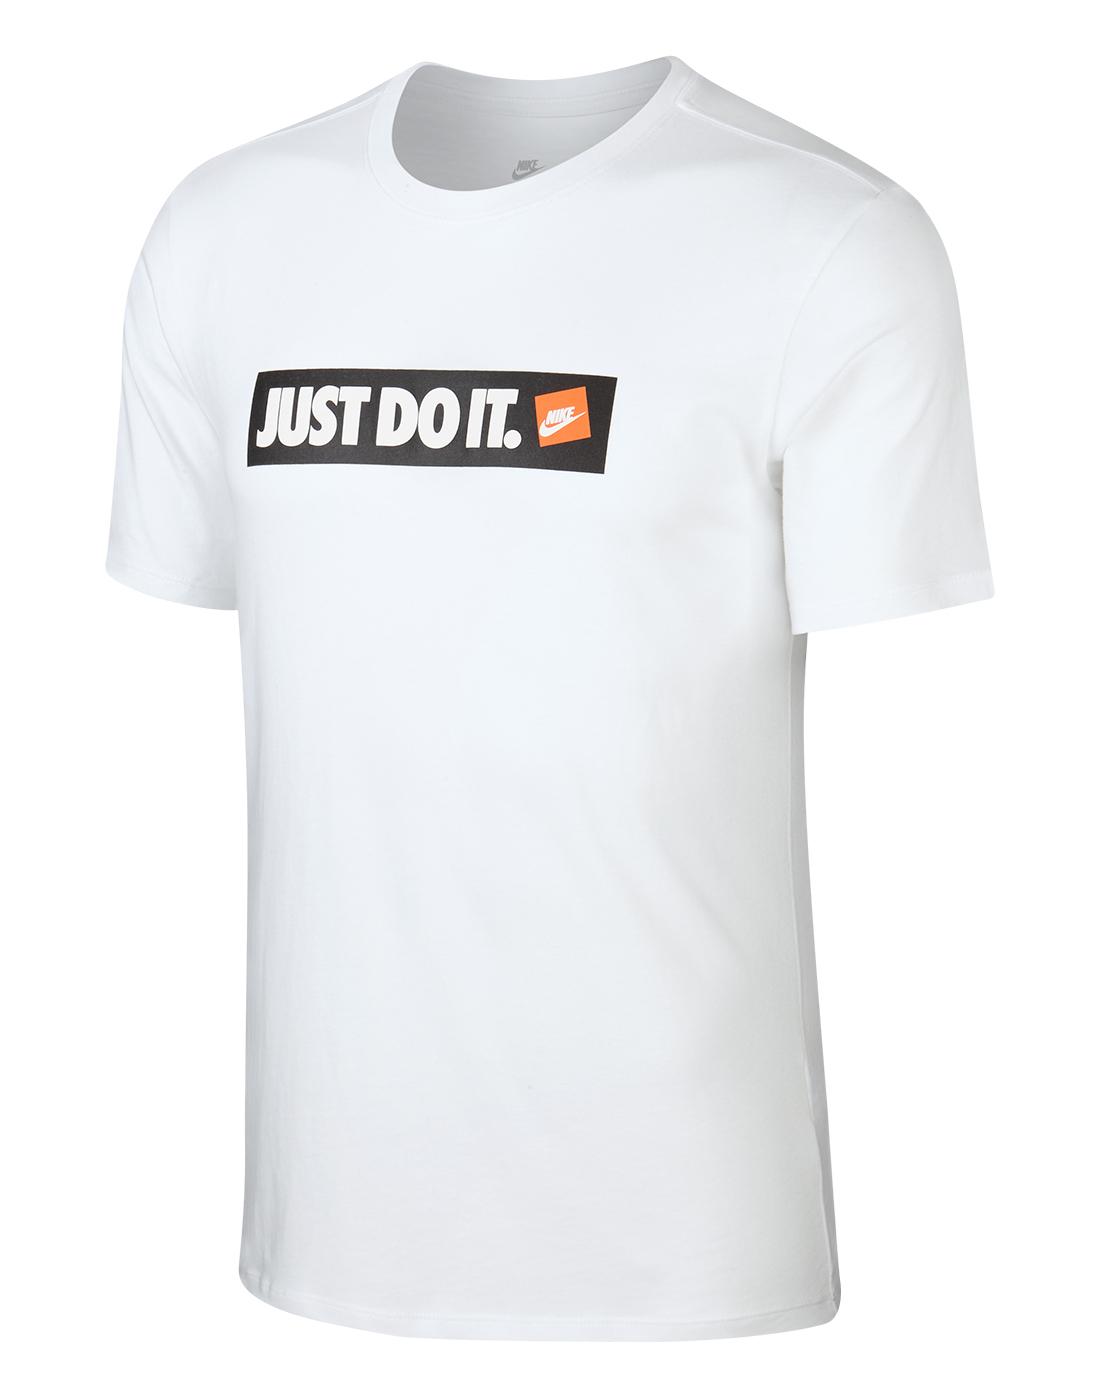 Men's White Nike Just Do It T-Shirt